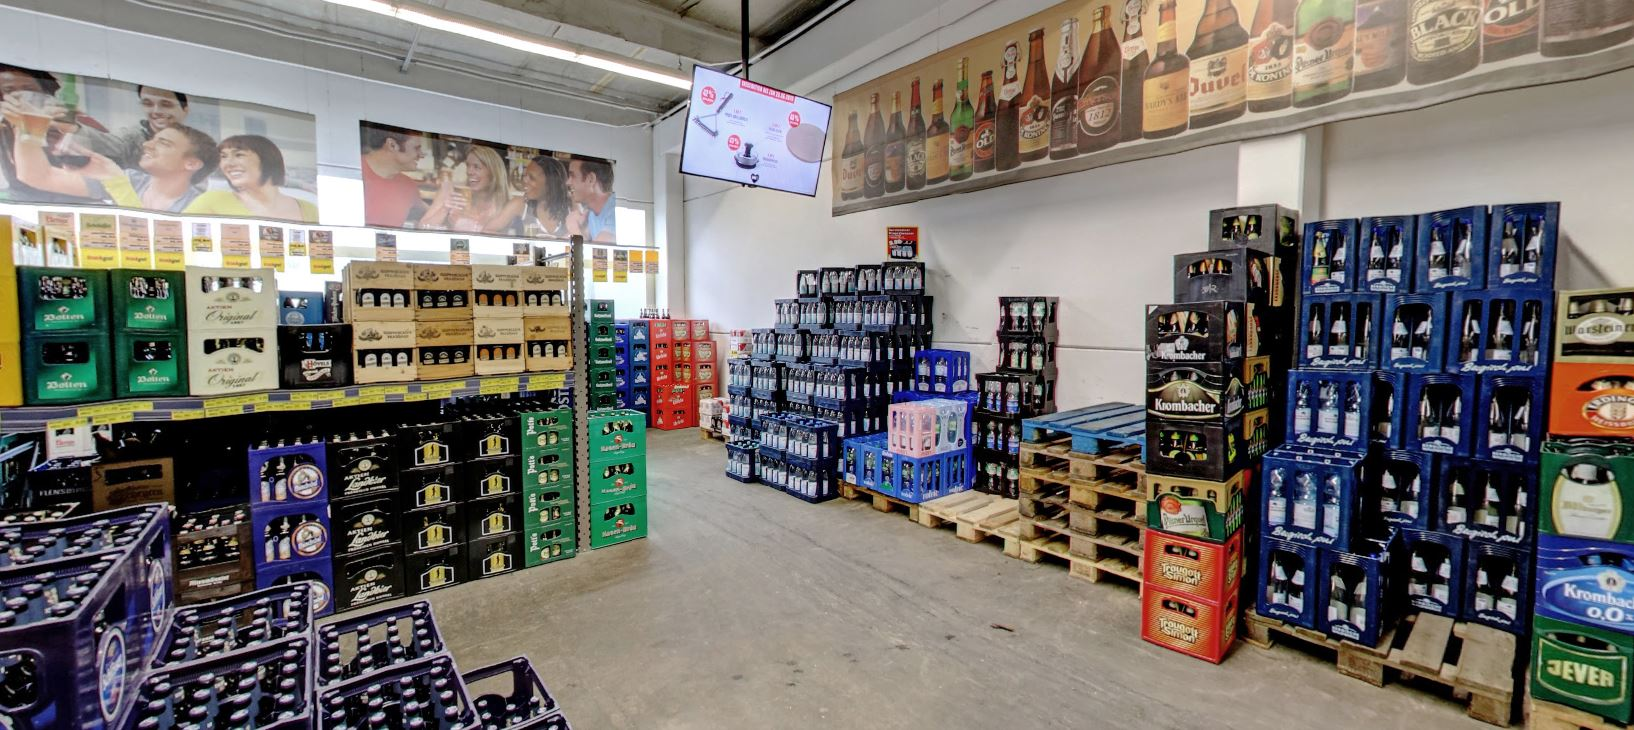 Foto des trinkgut Marktes Filiale Erkrath Hochdahl